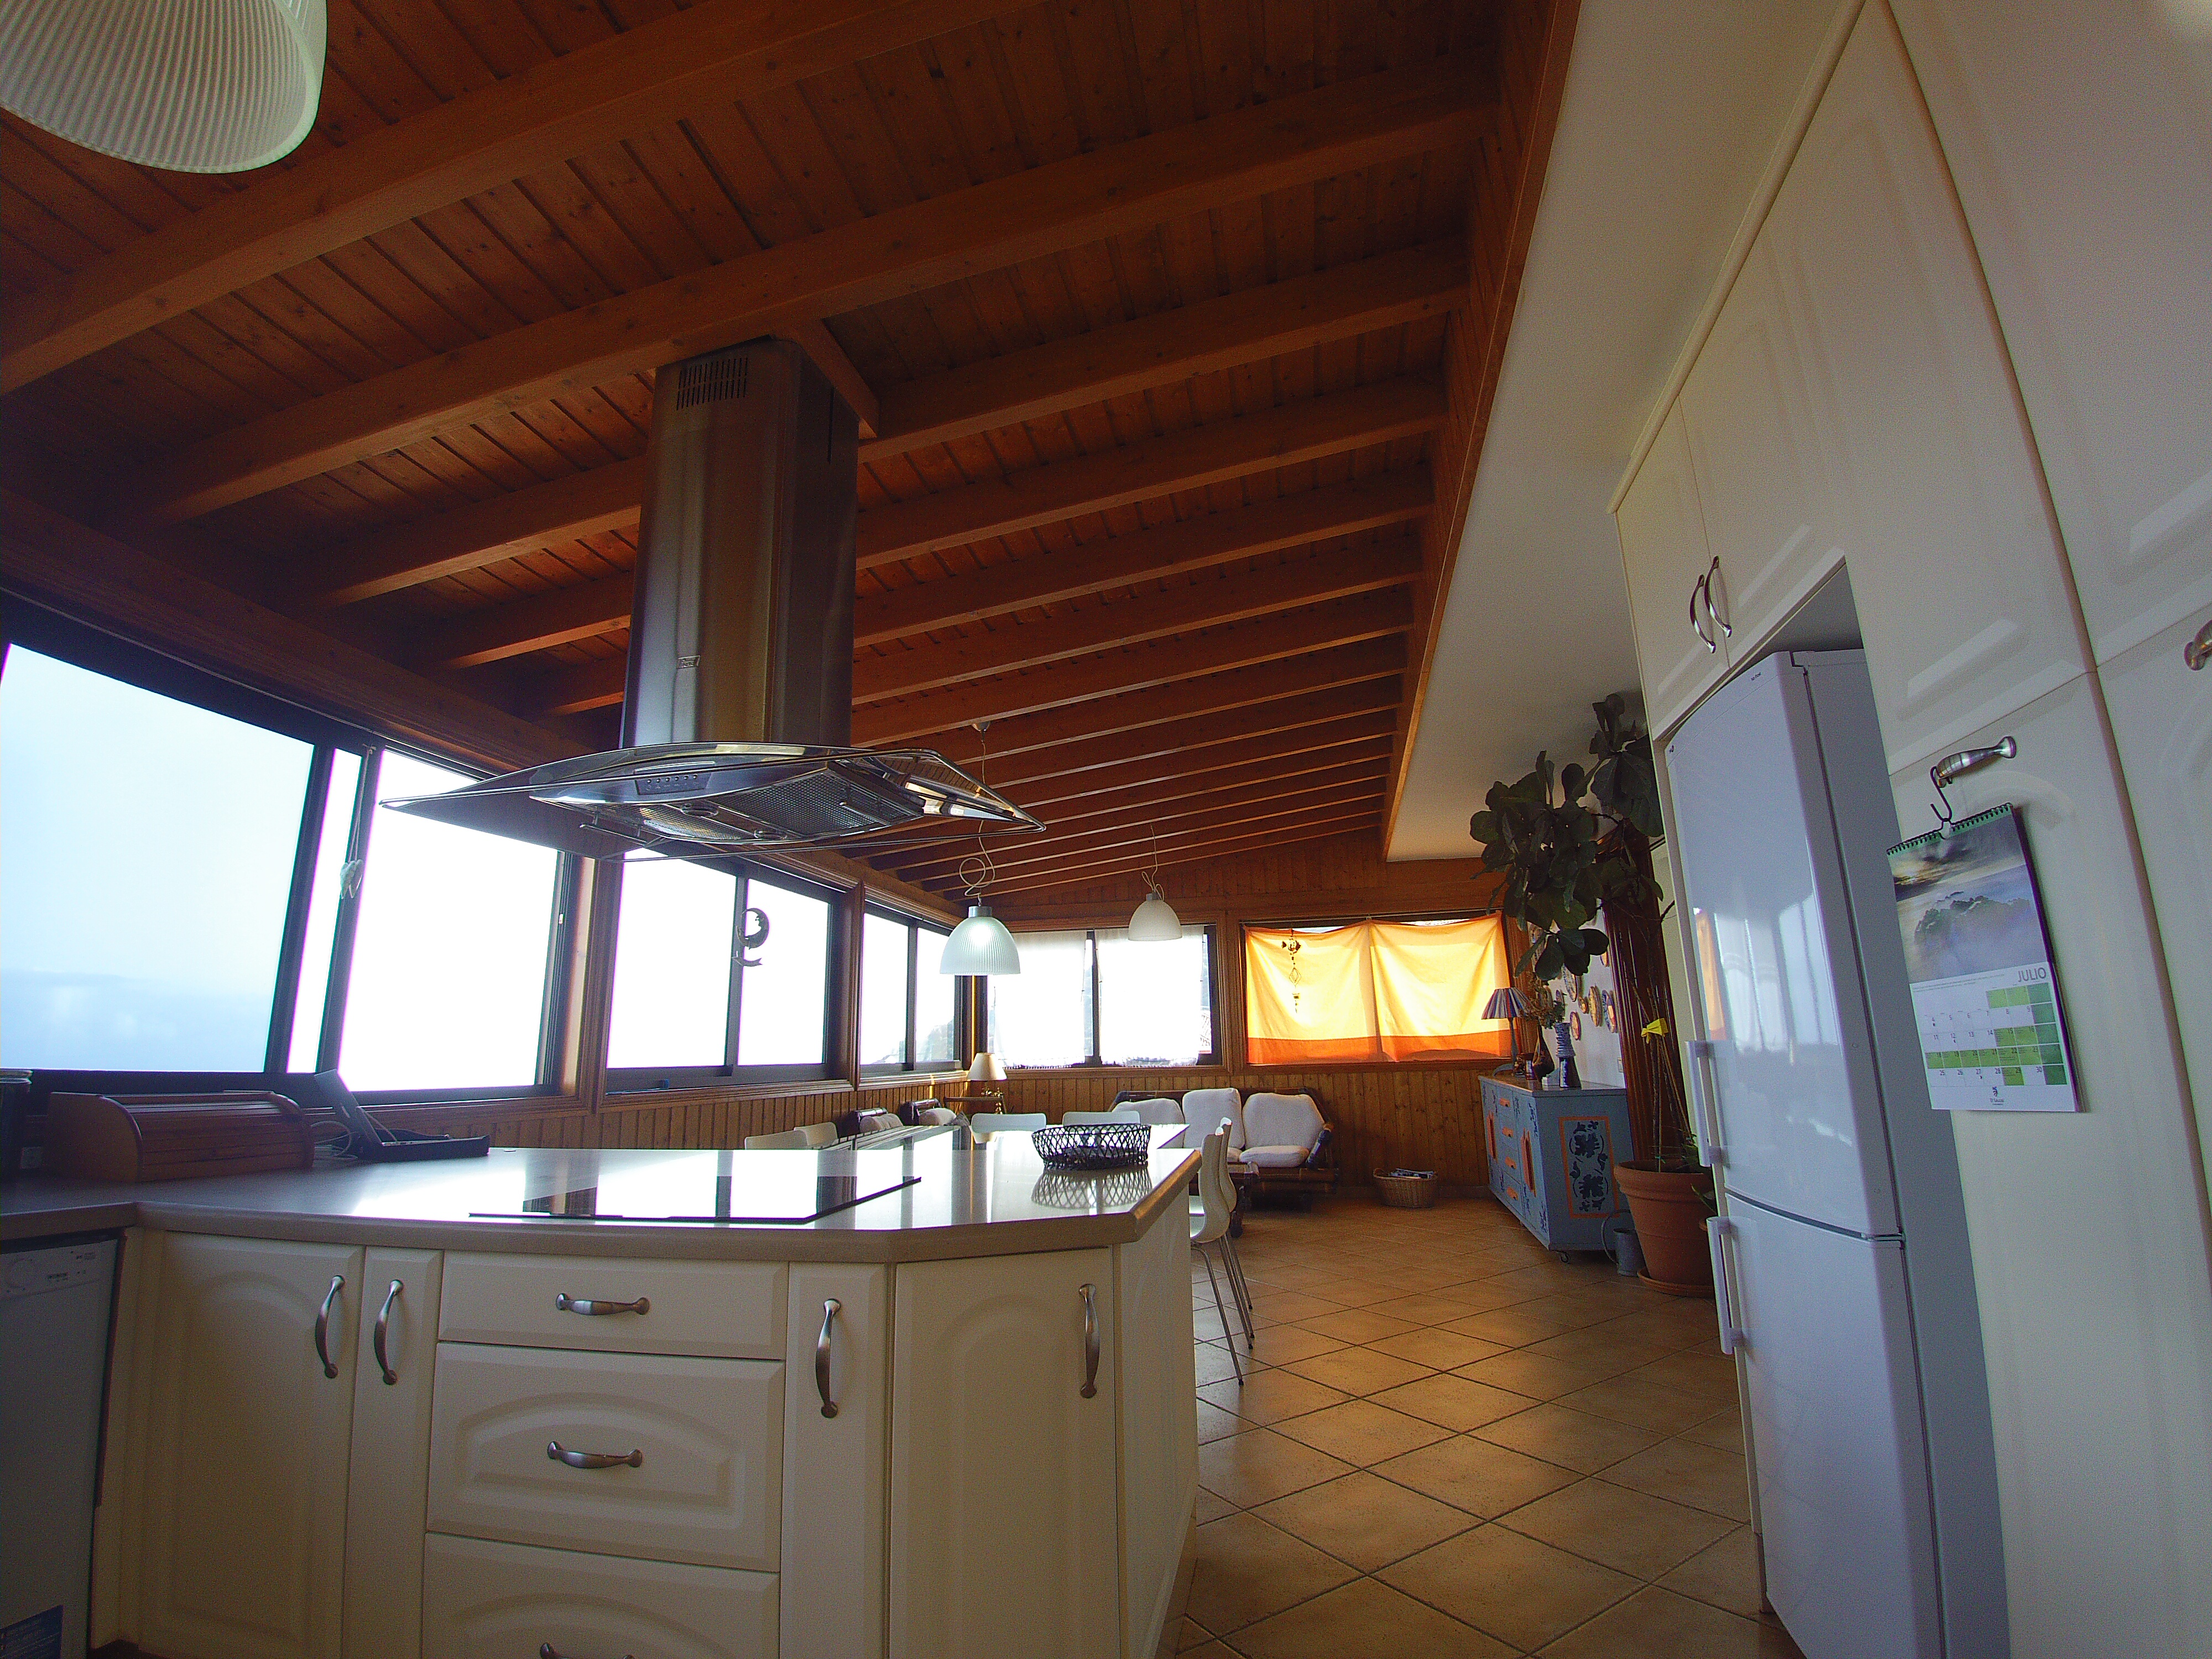 Maison de vacances Villa Primavera beheizbarer Pool kostenloses Wifi Grill (2125225), El Sauzal, Ténérife, Iles Canaries, Espagne, image 9